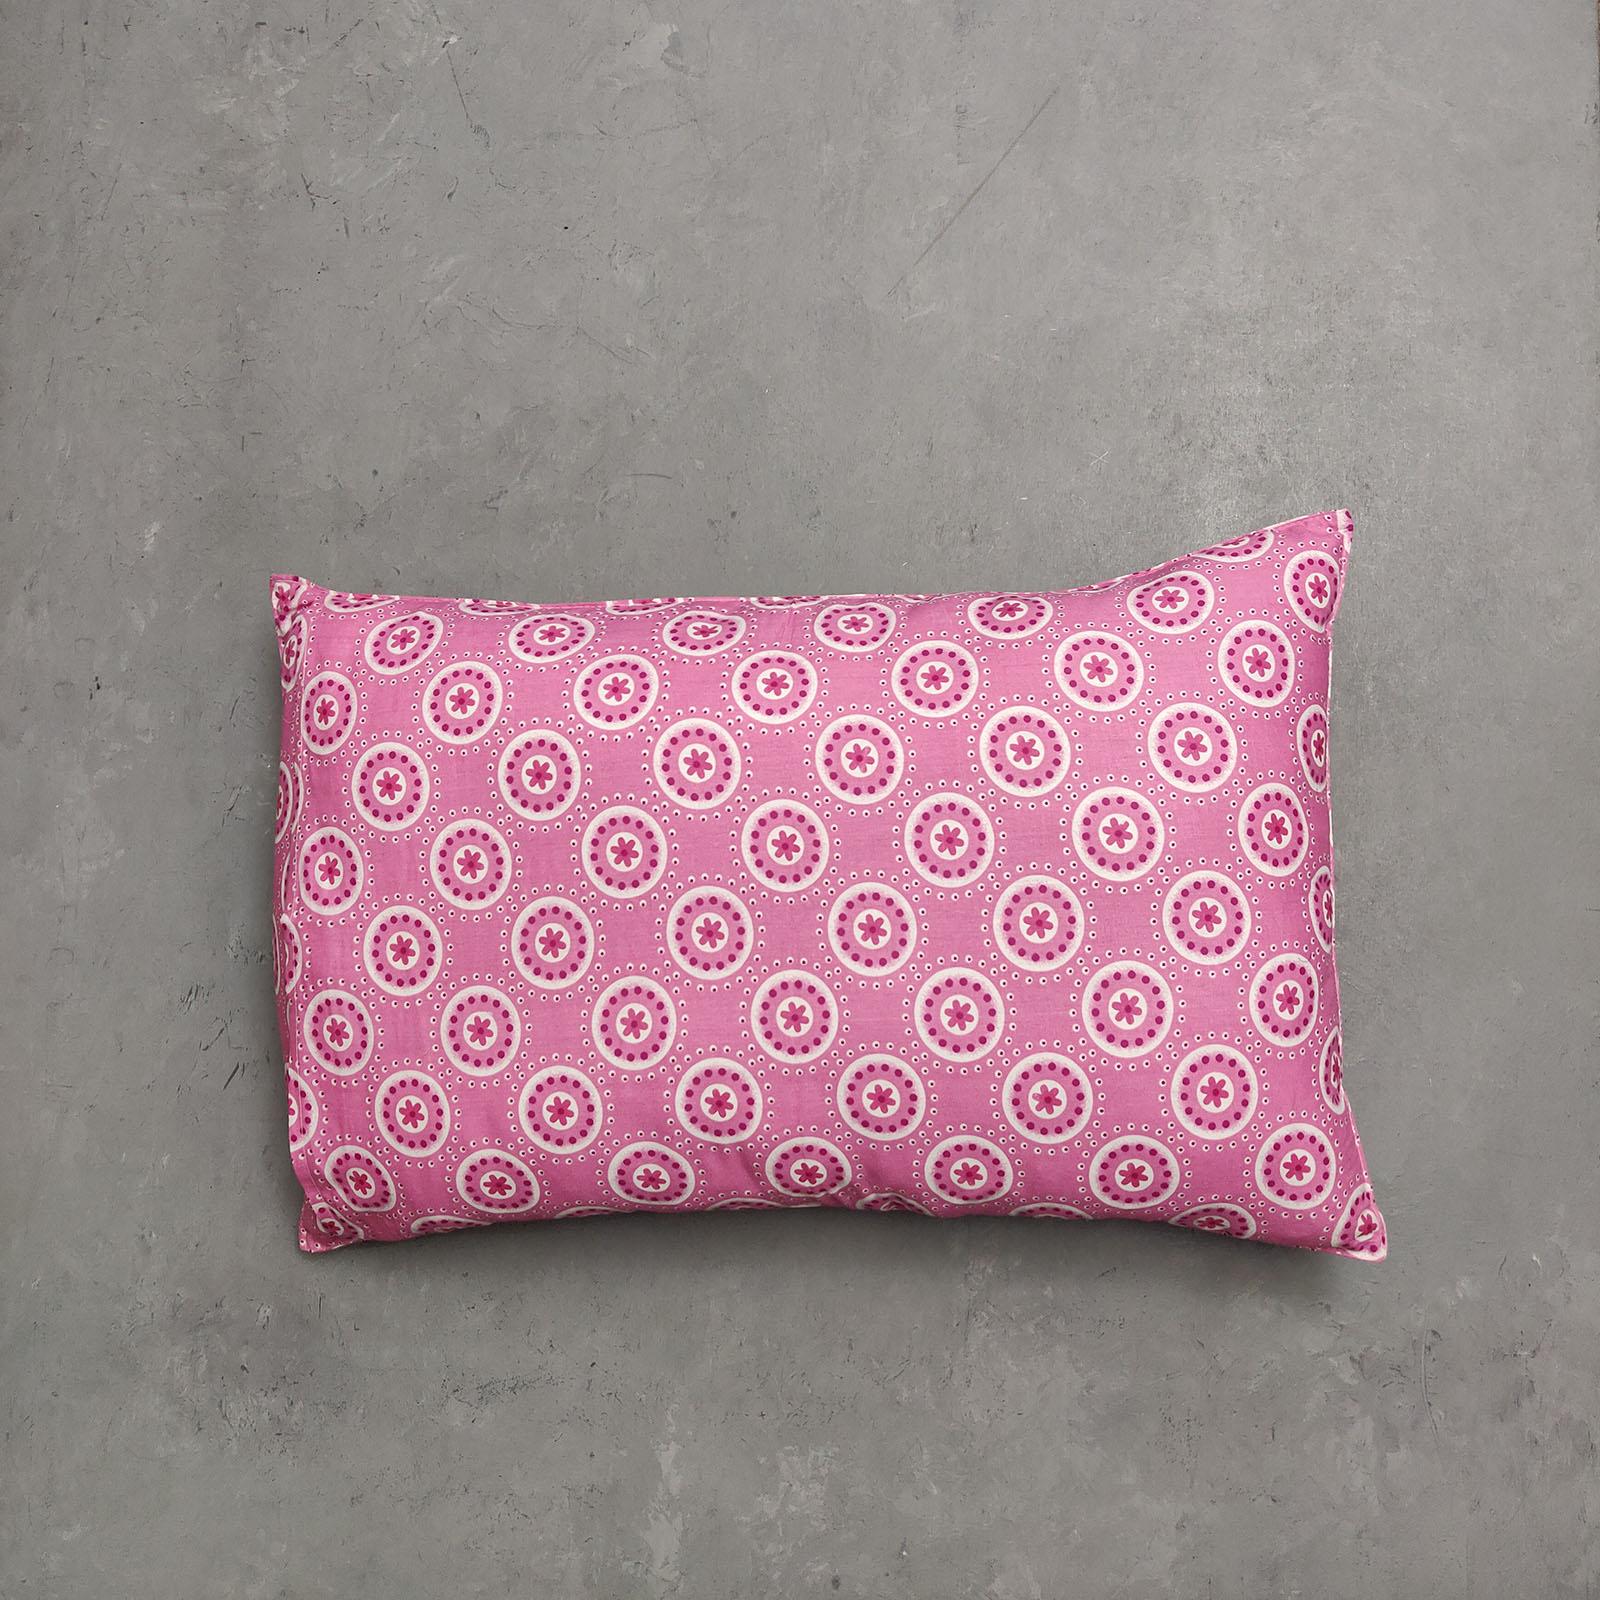 Pink Pillow Cover HPC176